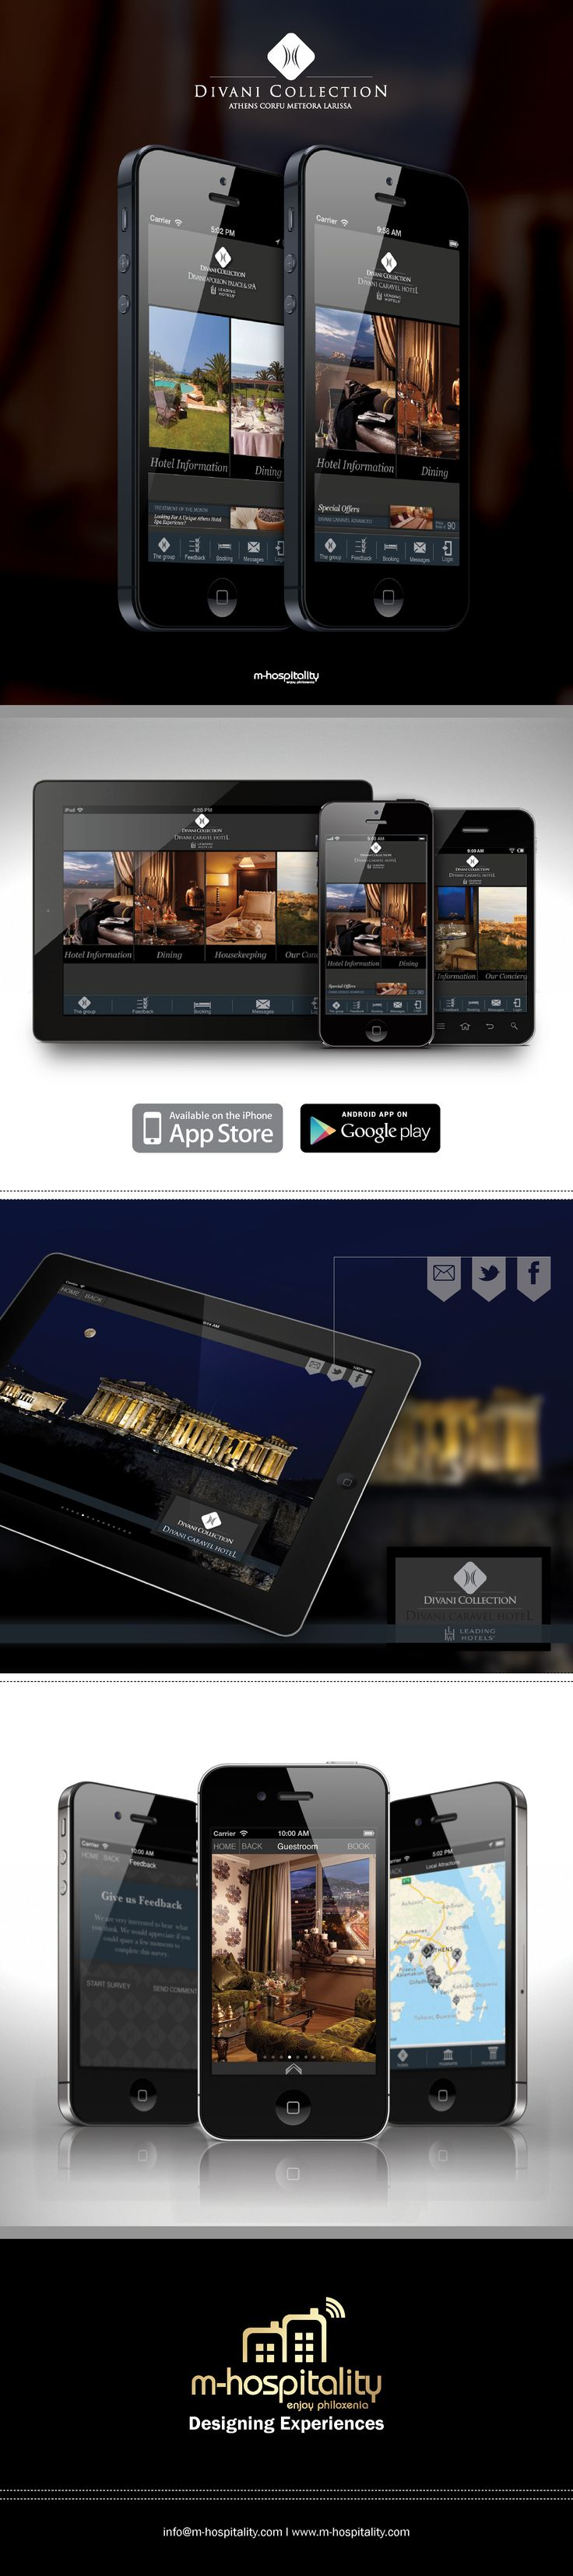 Divani hotels App